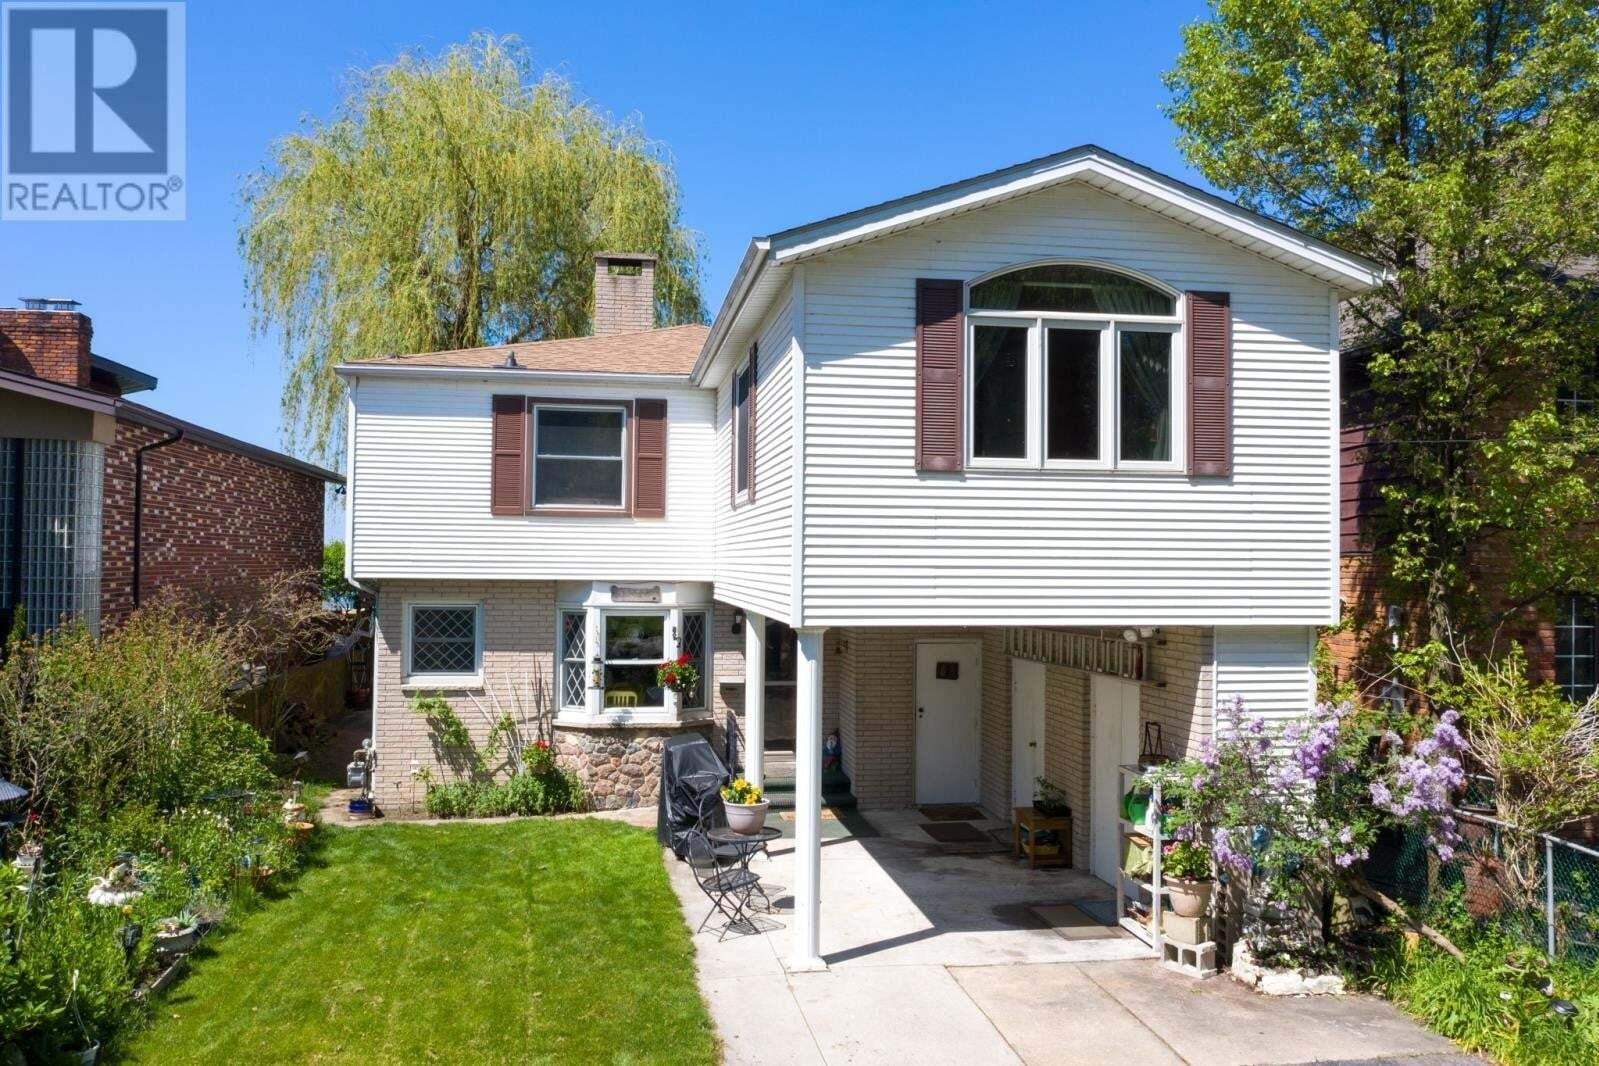 House for sale at 13748 Riverside Dr East Tecumseh Ontario - MLS: 20005918